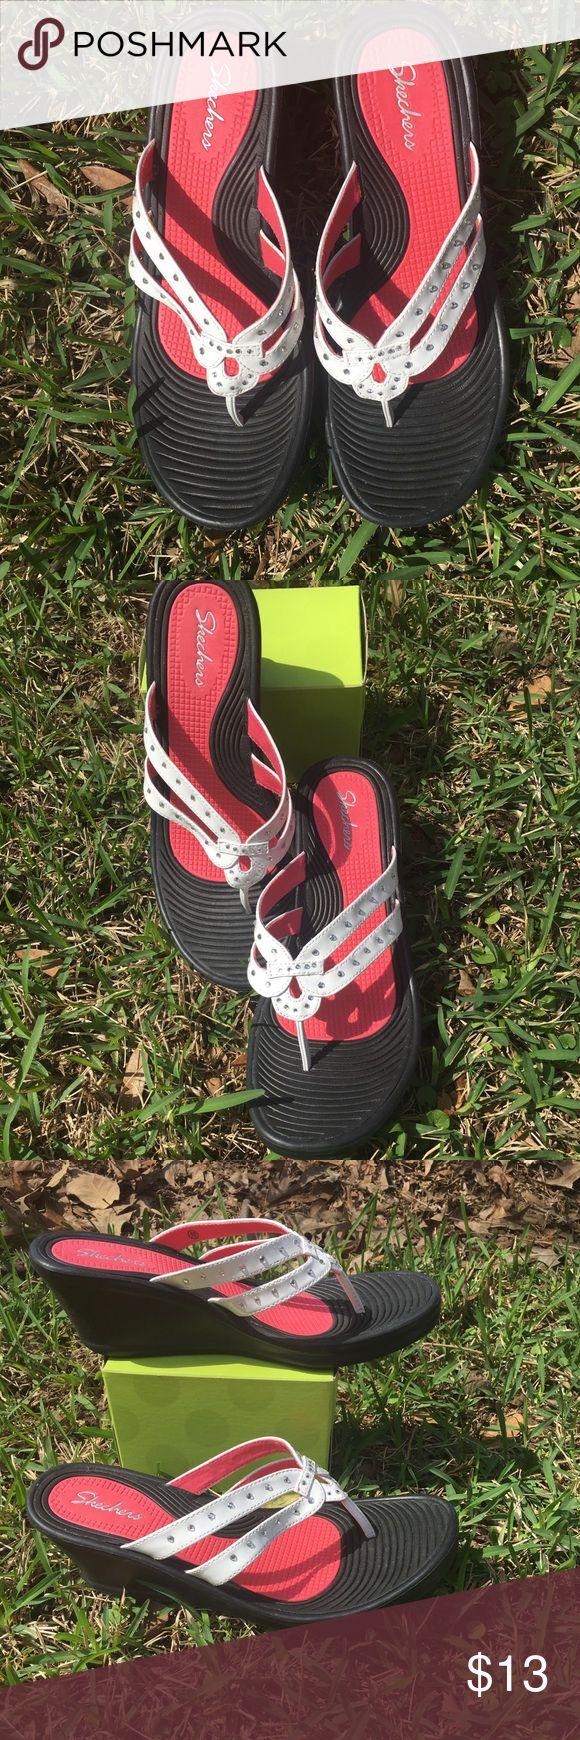 Skechers Rubber Flip Flops White with rhinestones Skechers Wedges. NWOT Skechers Shoes